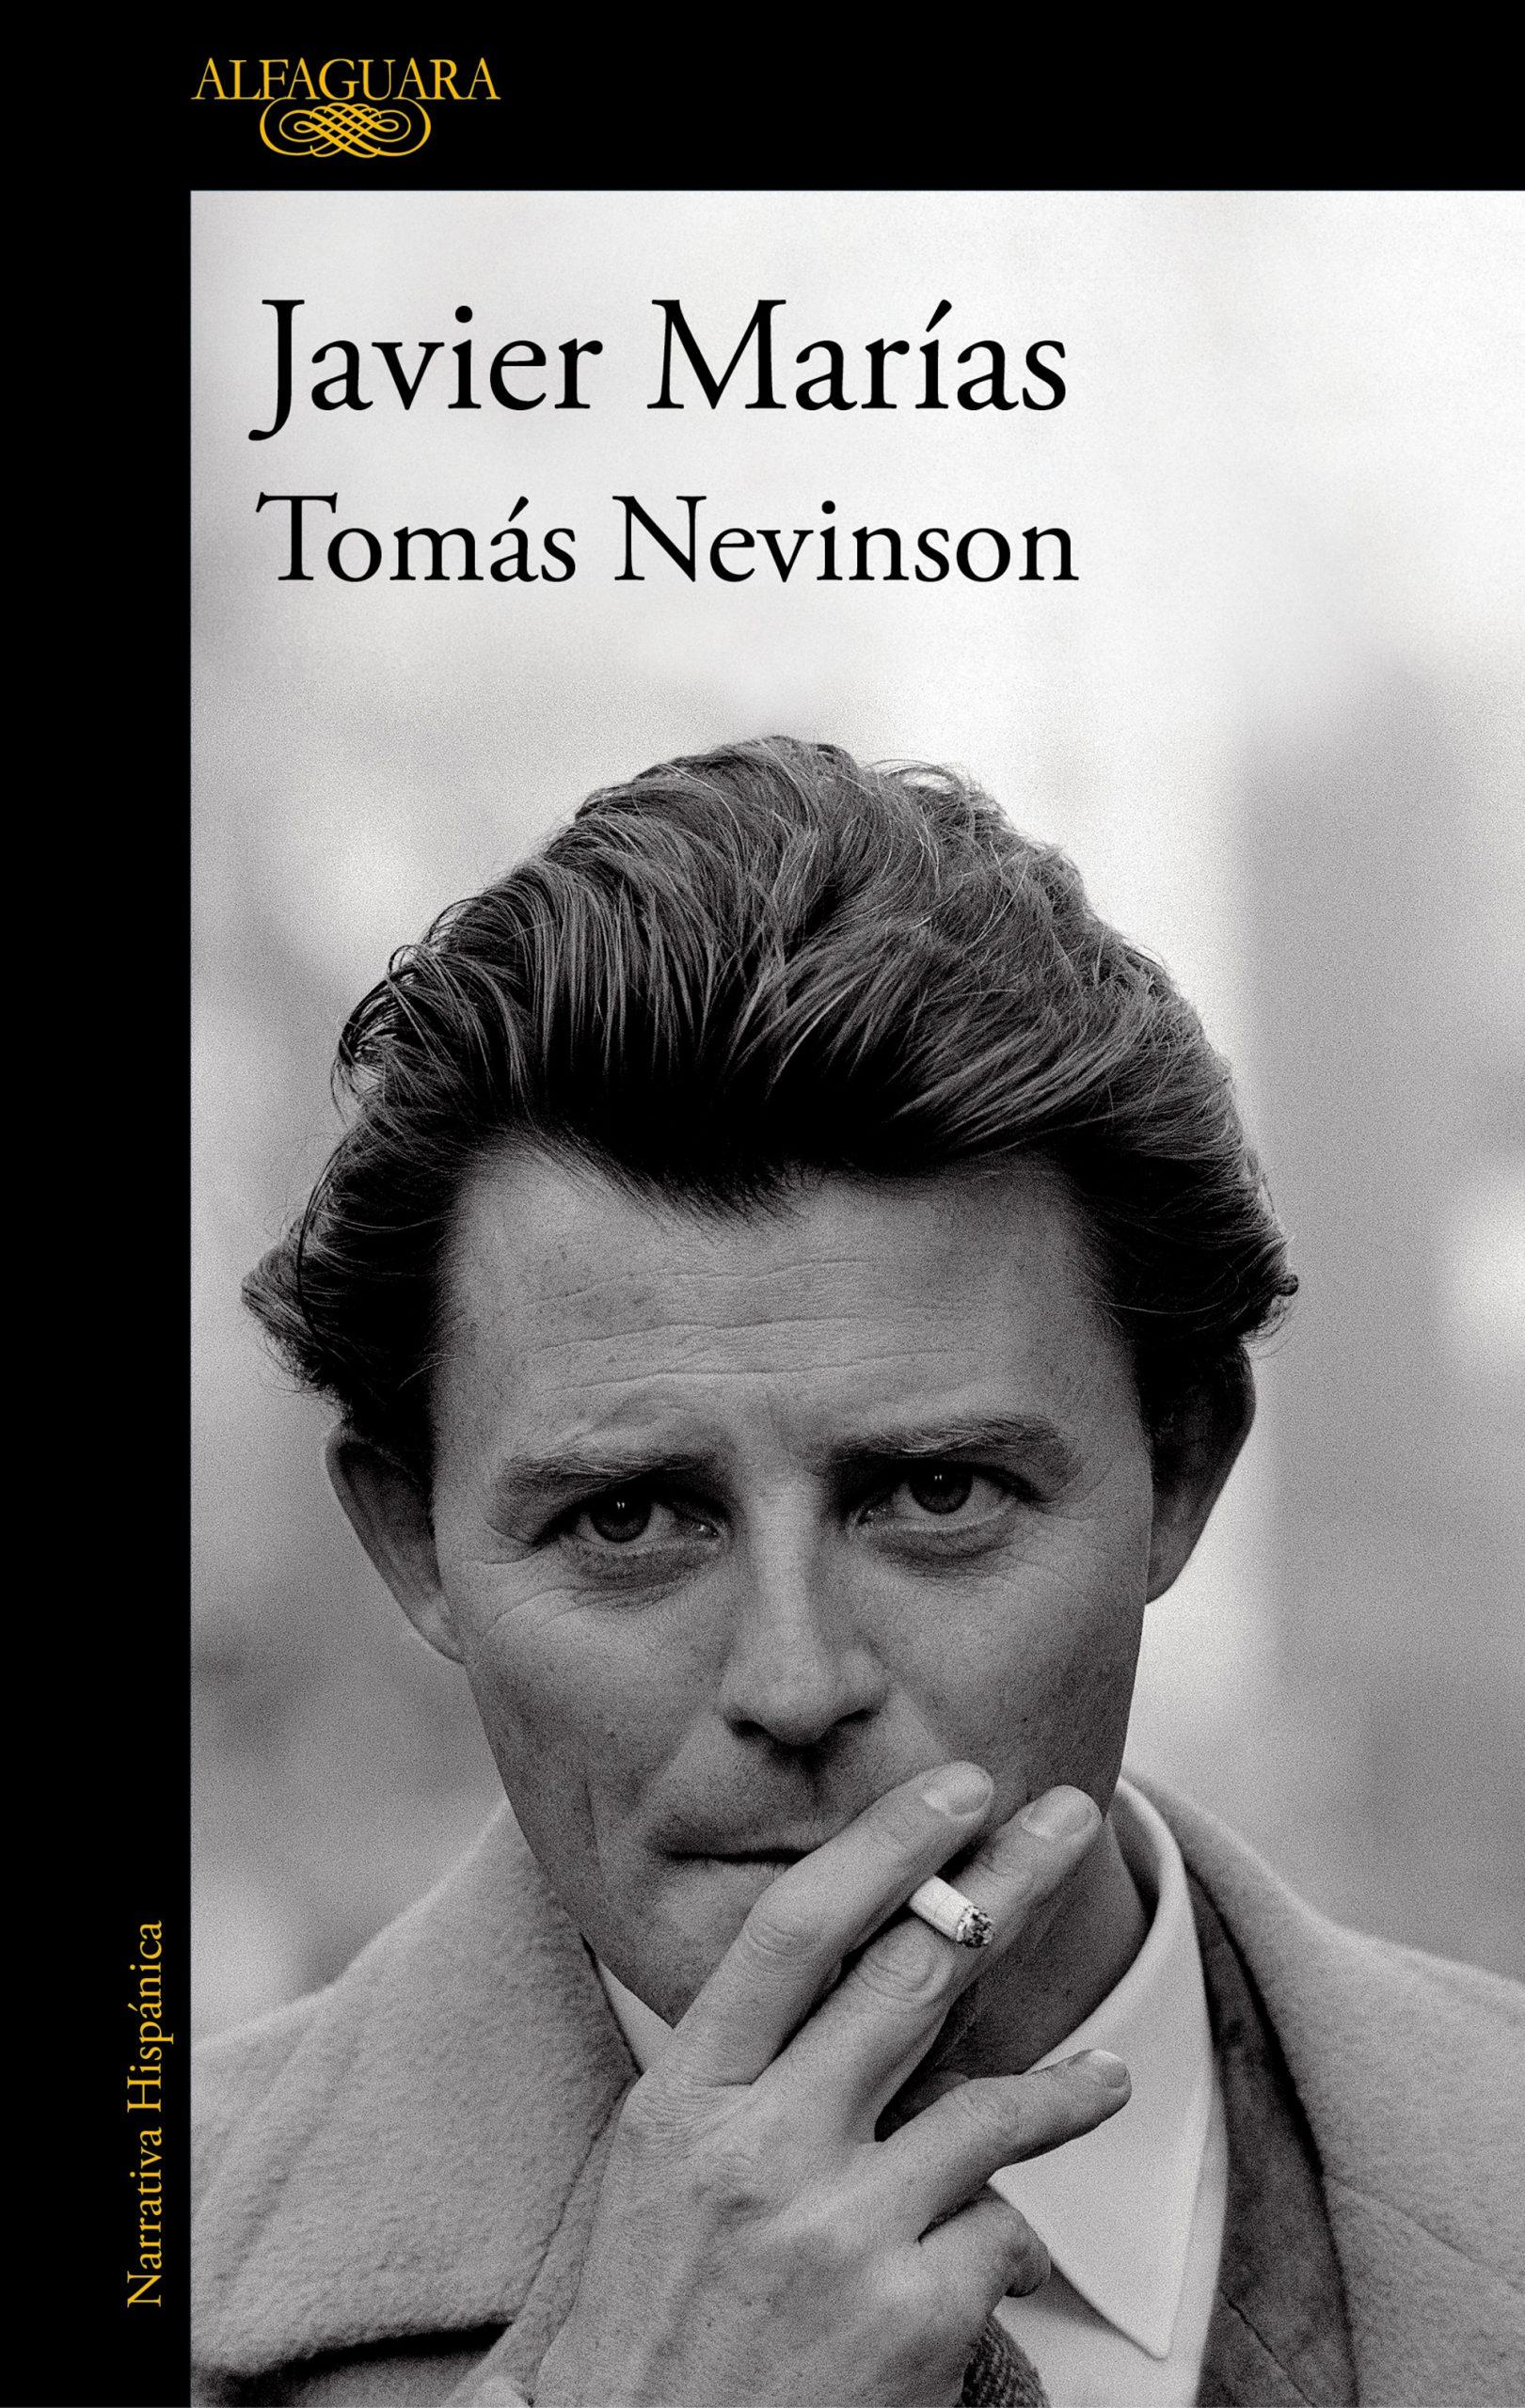 TOMAS NEVINSON